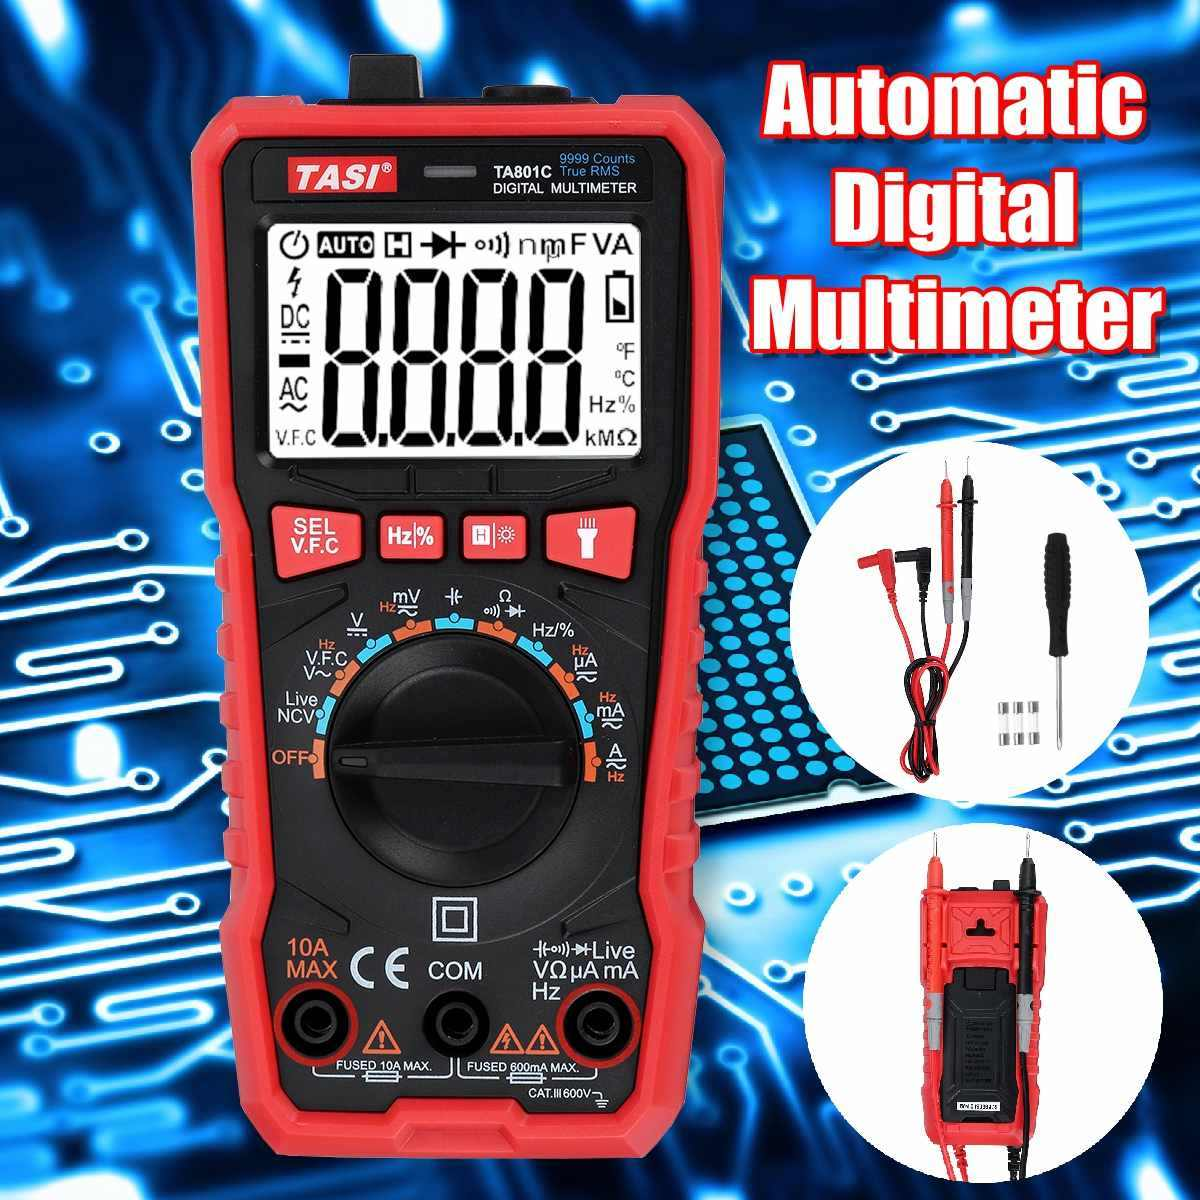 Ta801c True Rms Lcd Digital 9999 Counts Automatic Multimeter Ac Dc